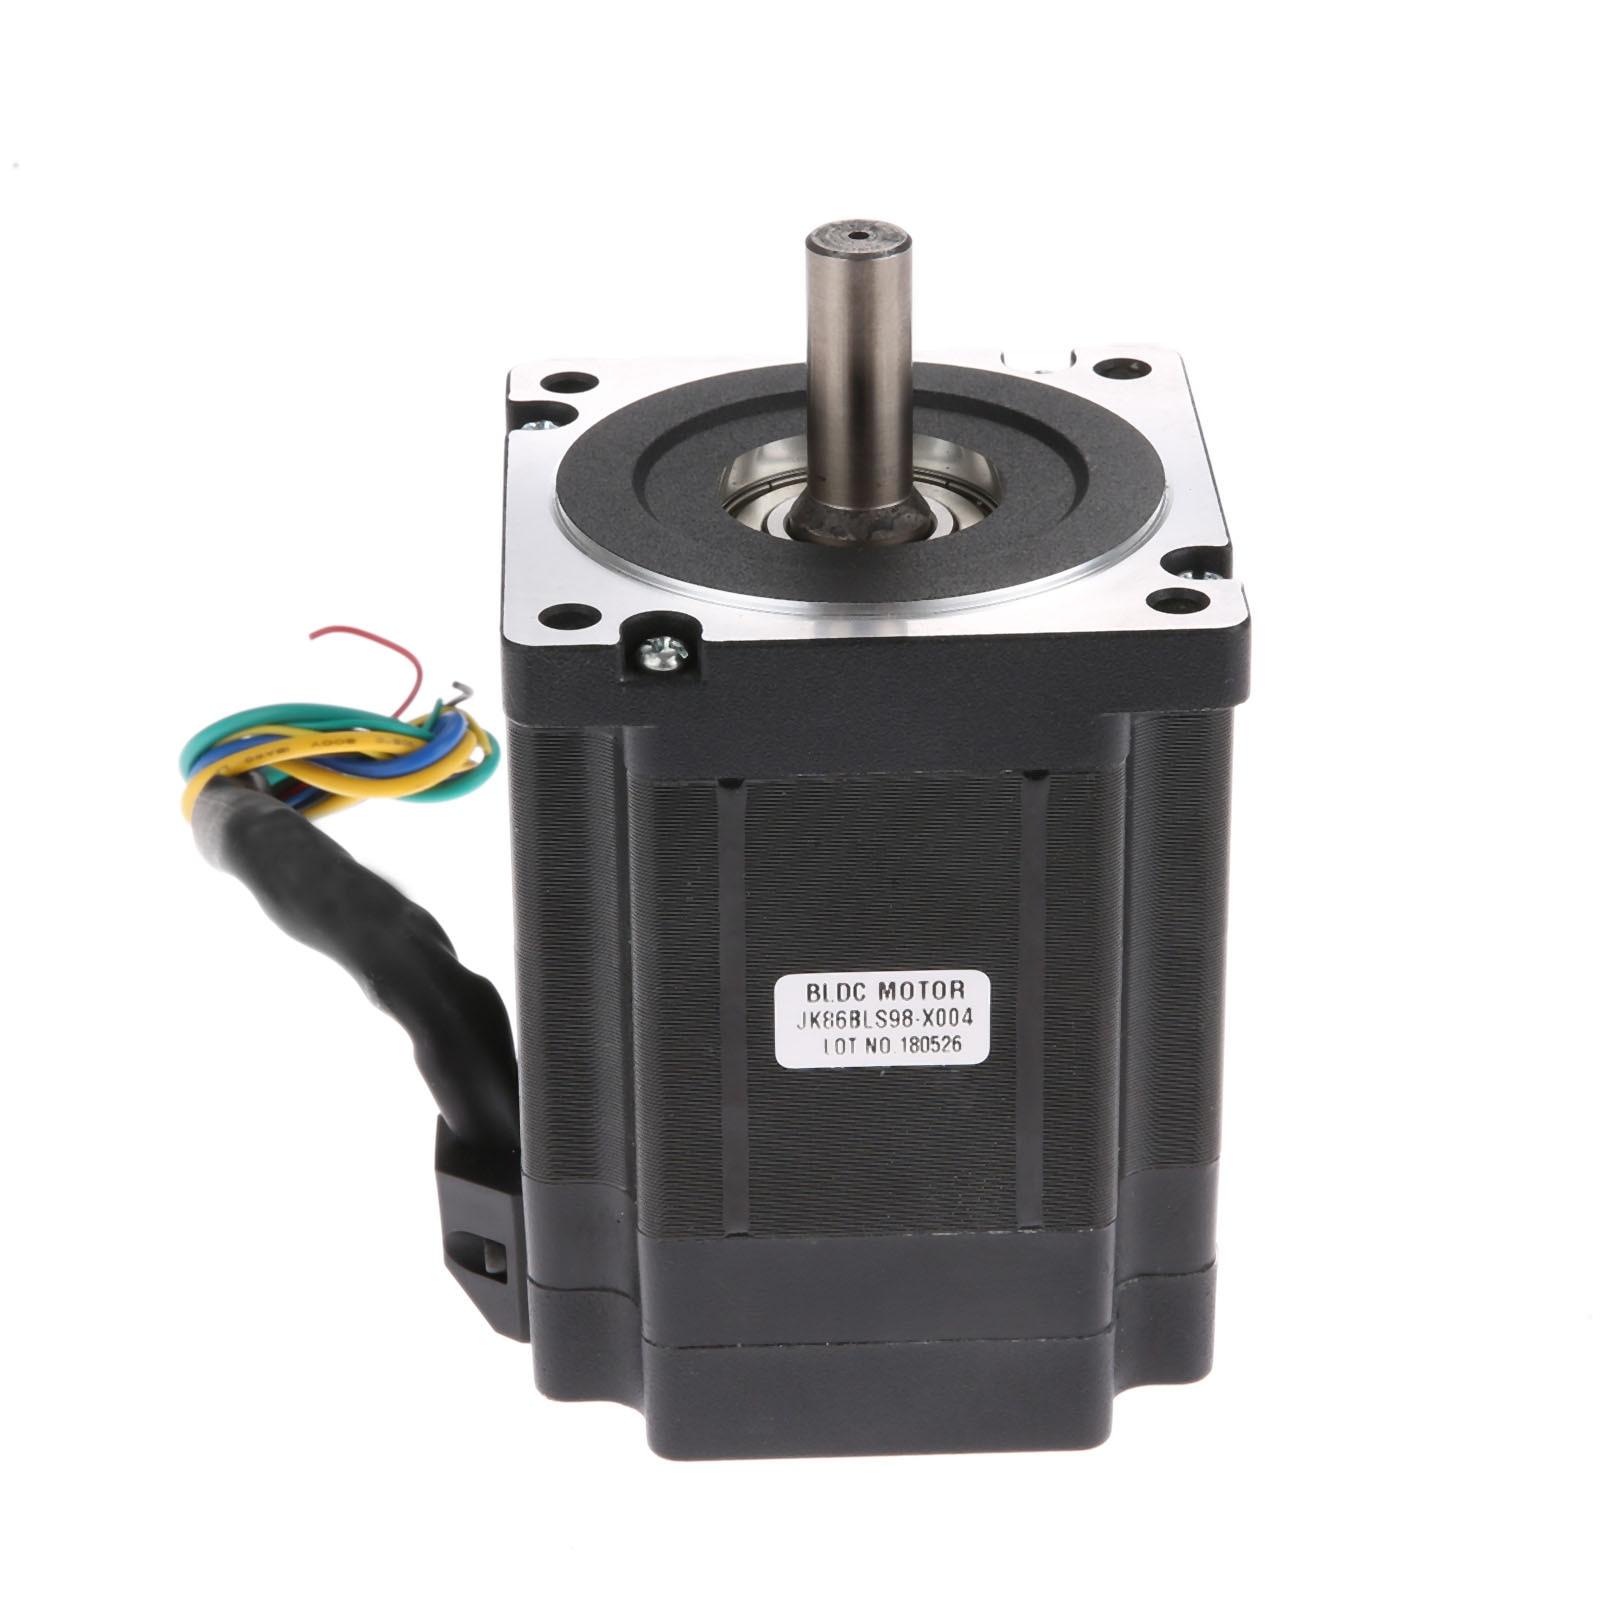 86BLS98 86x98mm Brushless DC Motor BLDC 48V 440W 3000RPM 3 Phase 1.4N.m/197.2oz.in. Small DC Motor For 3D Printer DIY Design